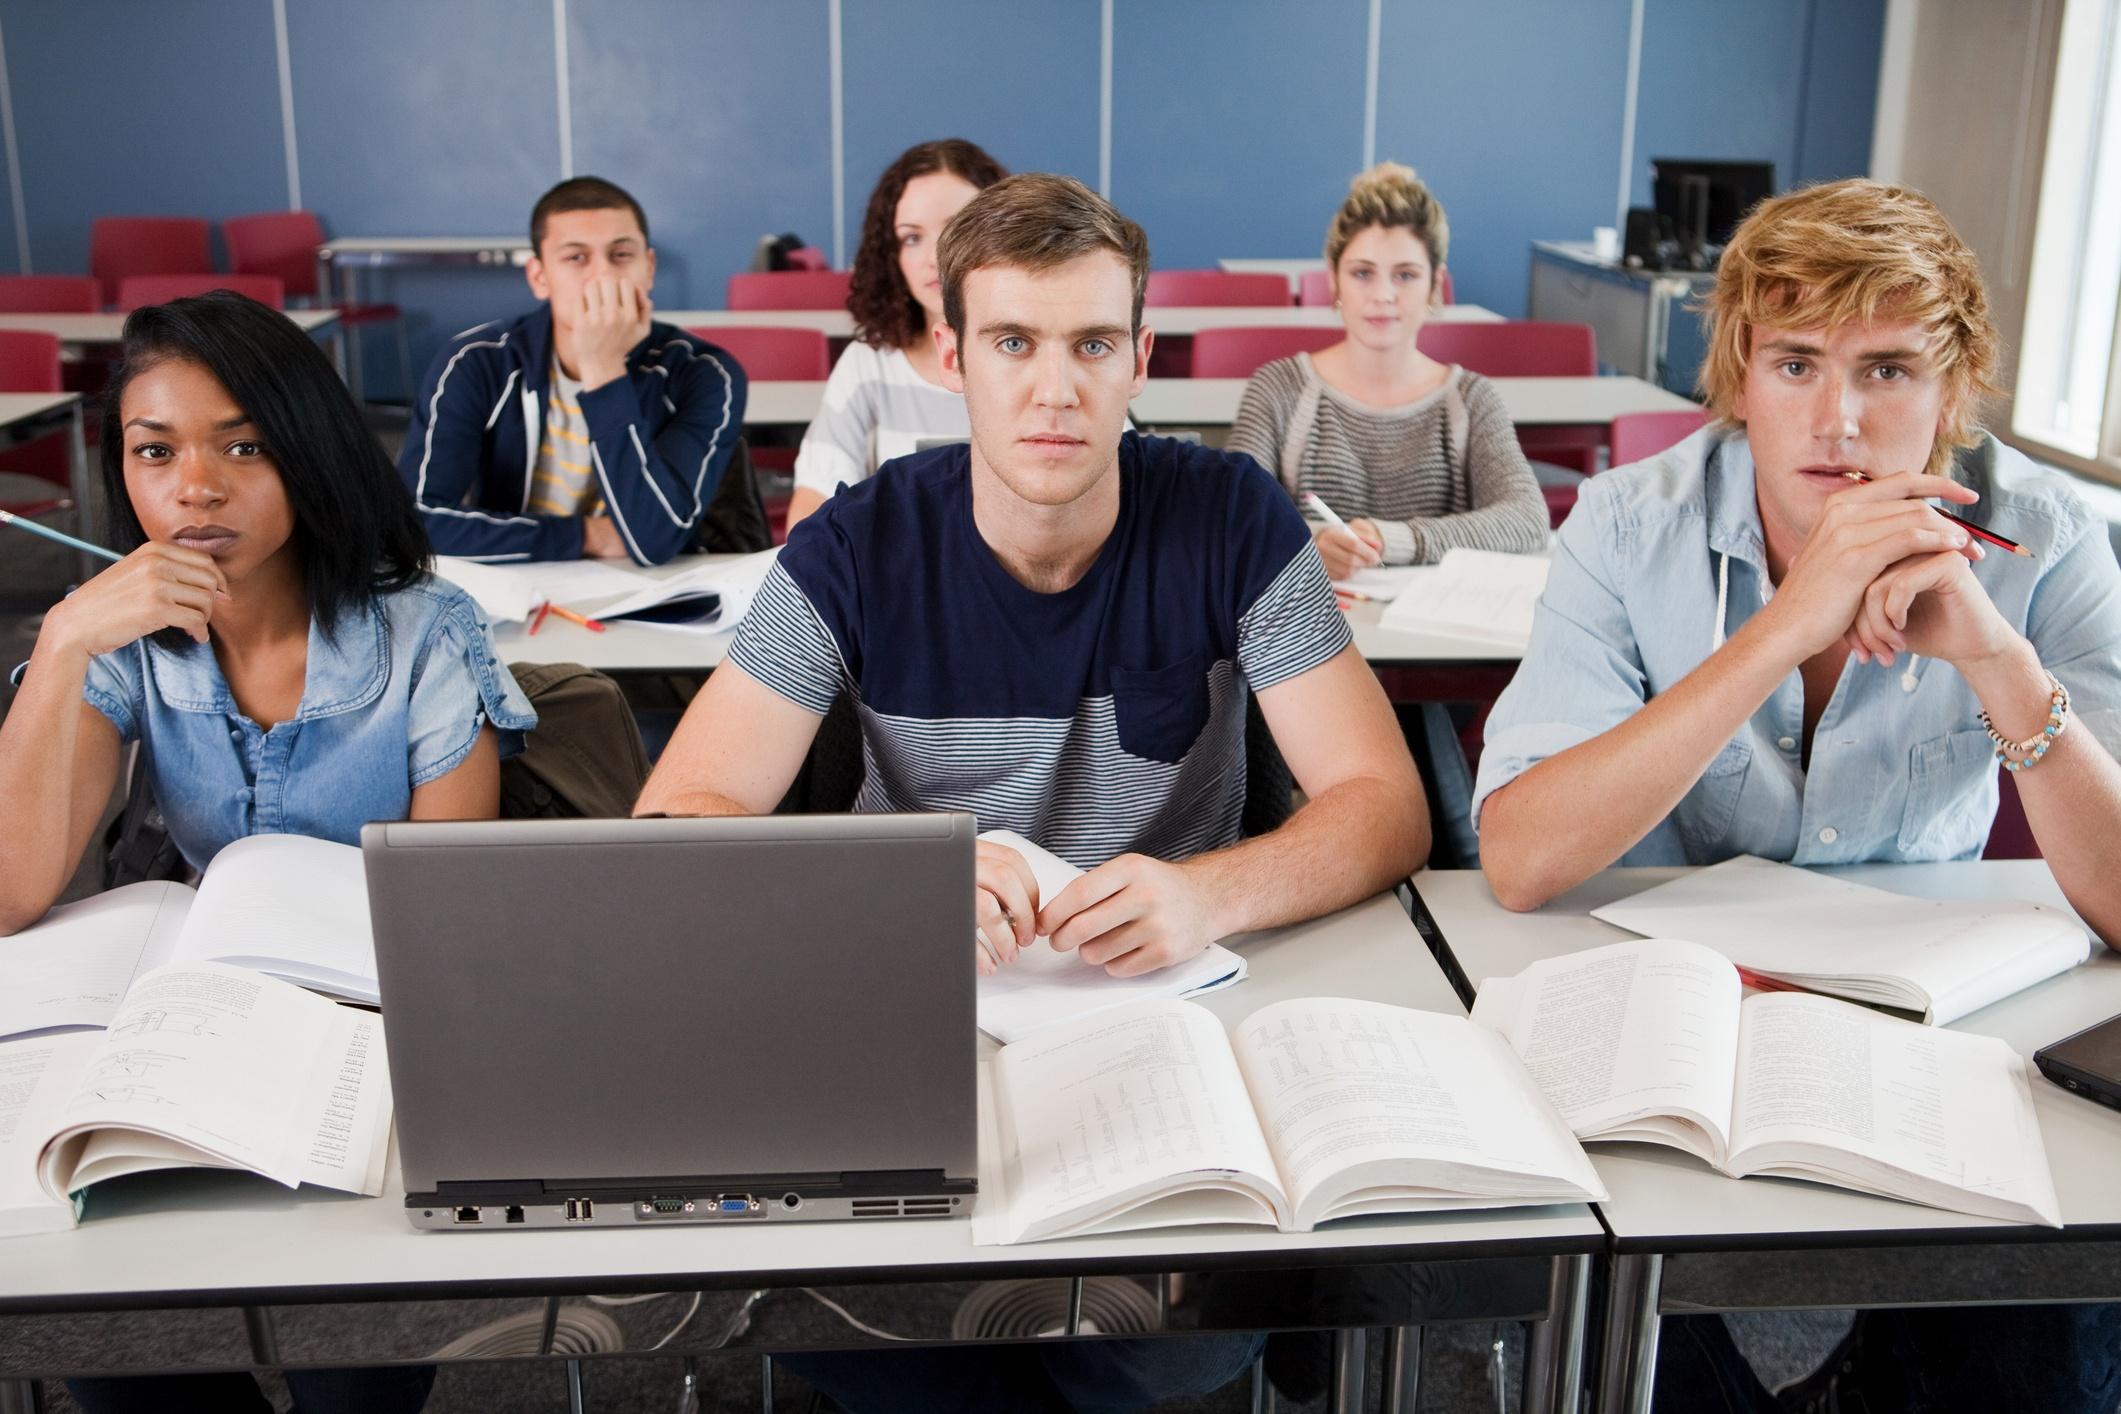 cyberthieves-are-targeting-student-data.jpg